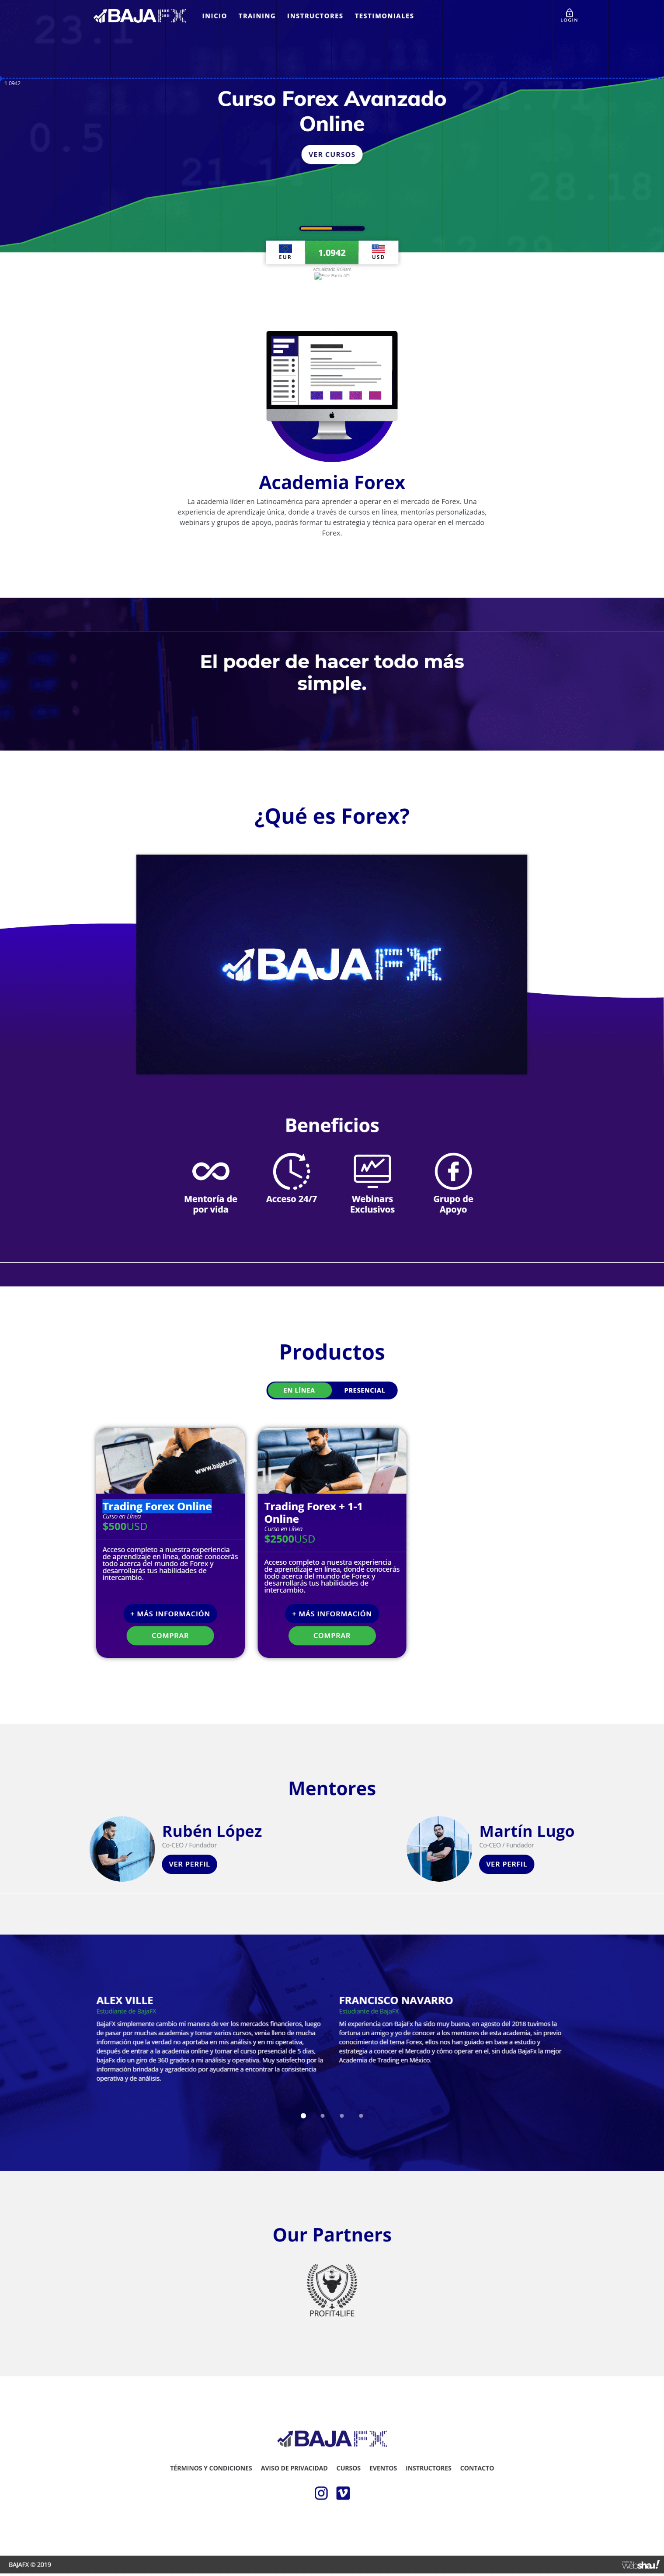 BajaFx Trading Forex Online